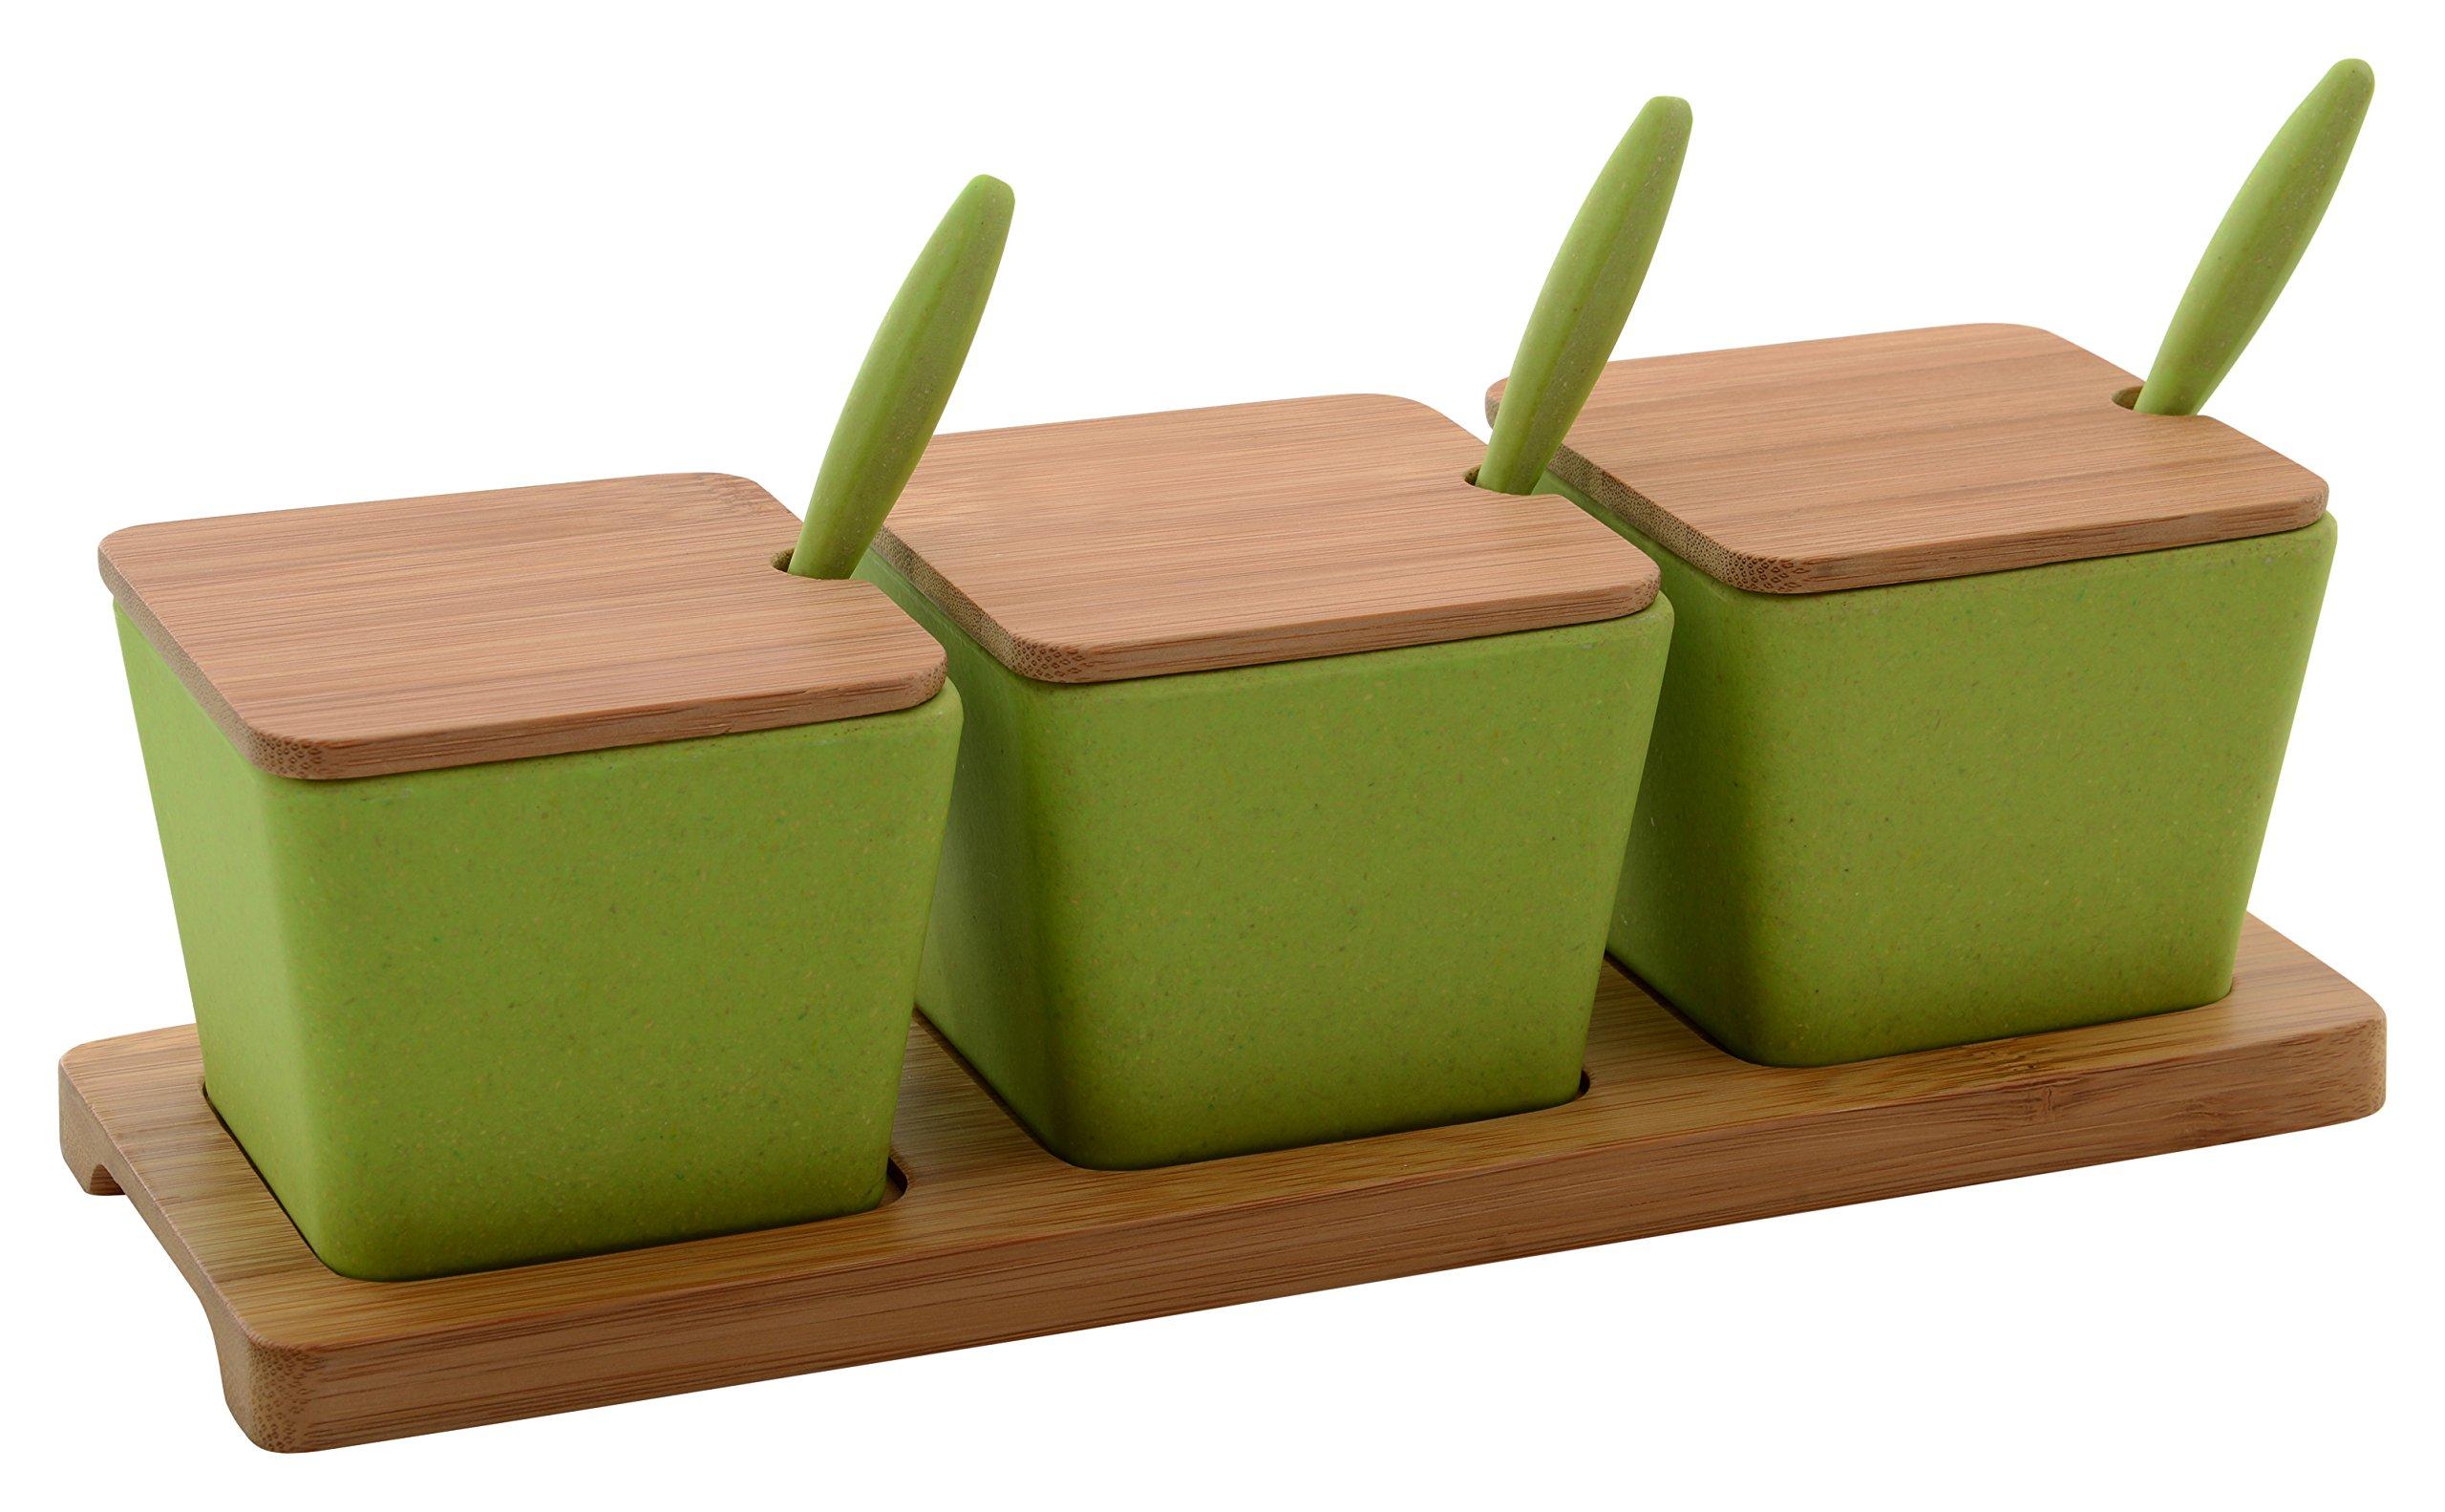 Berghoff CookNCo 10-Piece Condiment Set